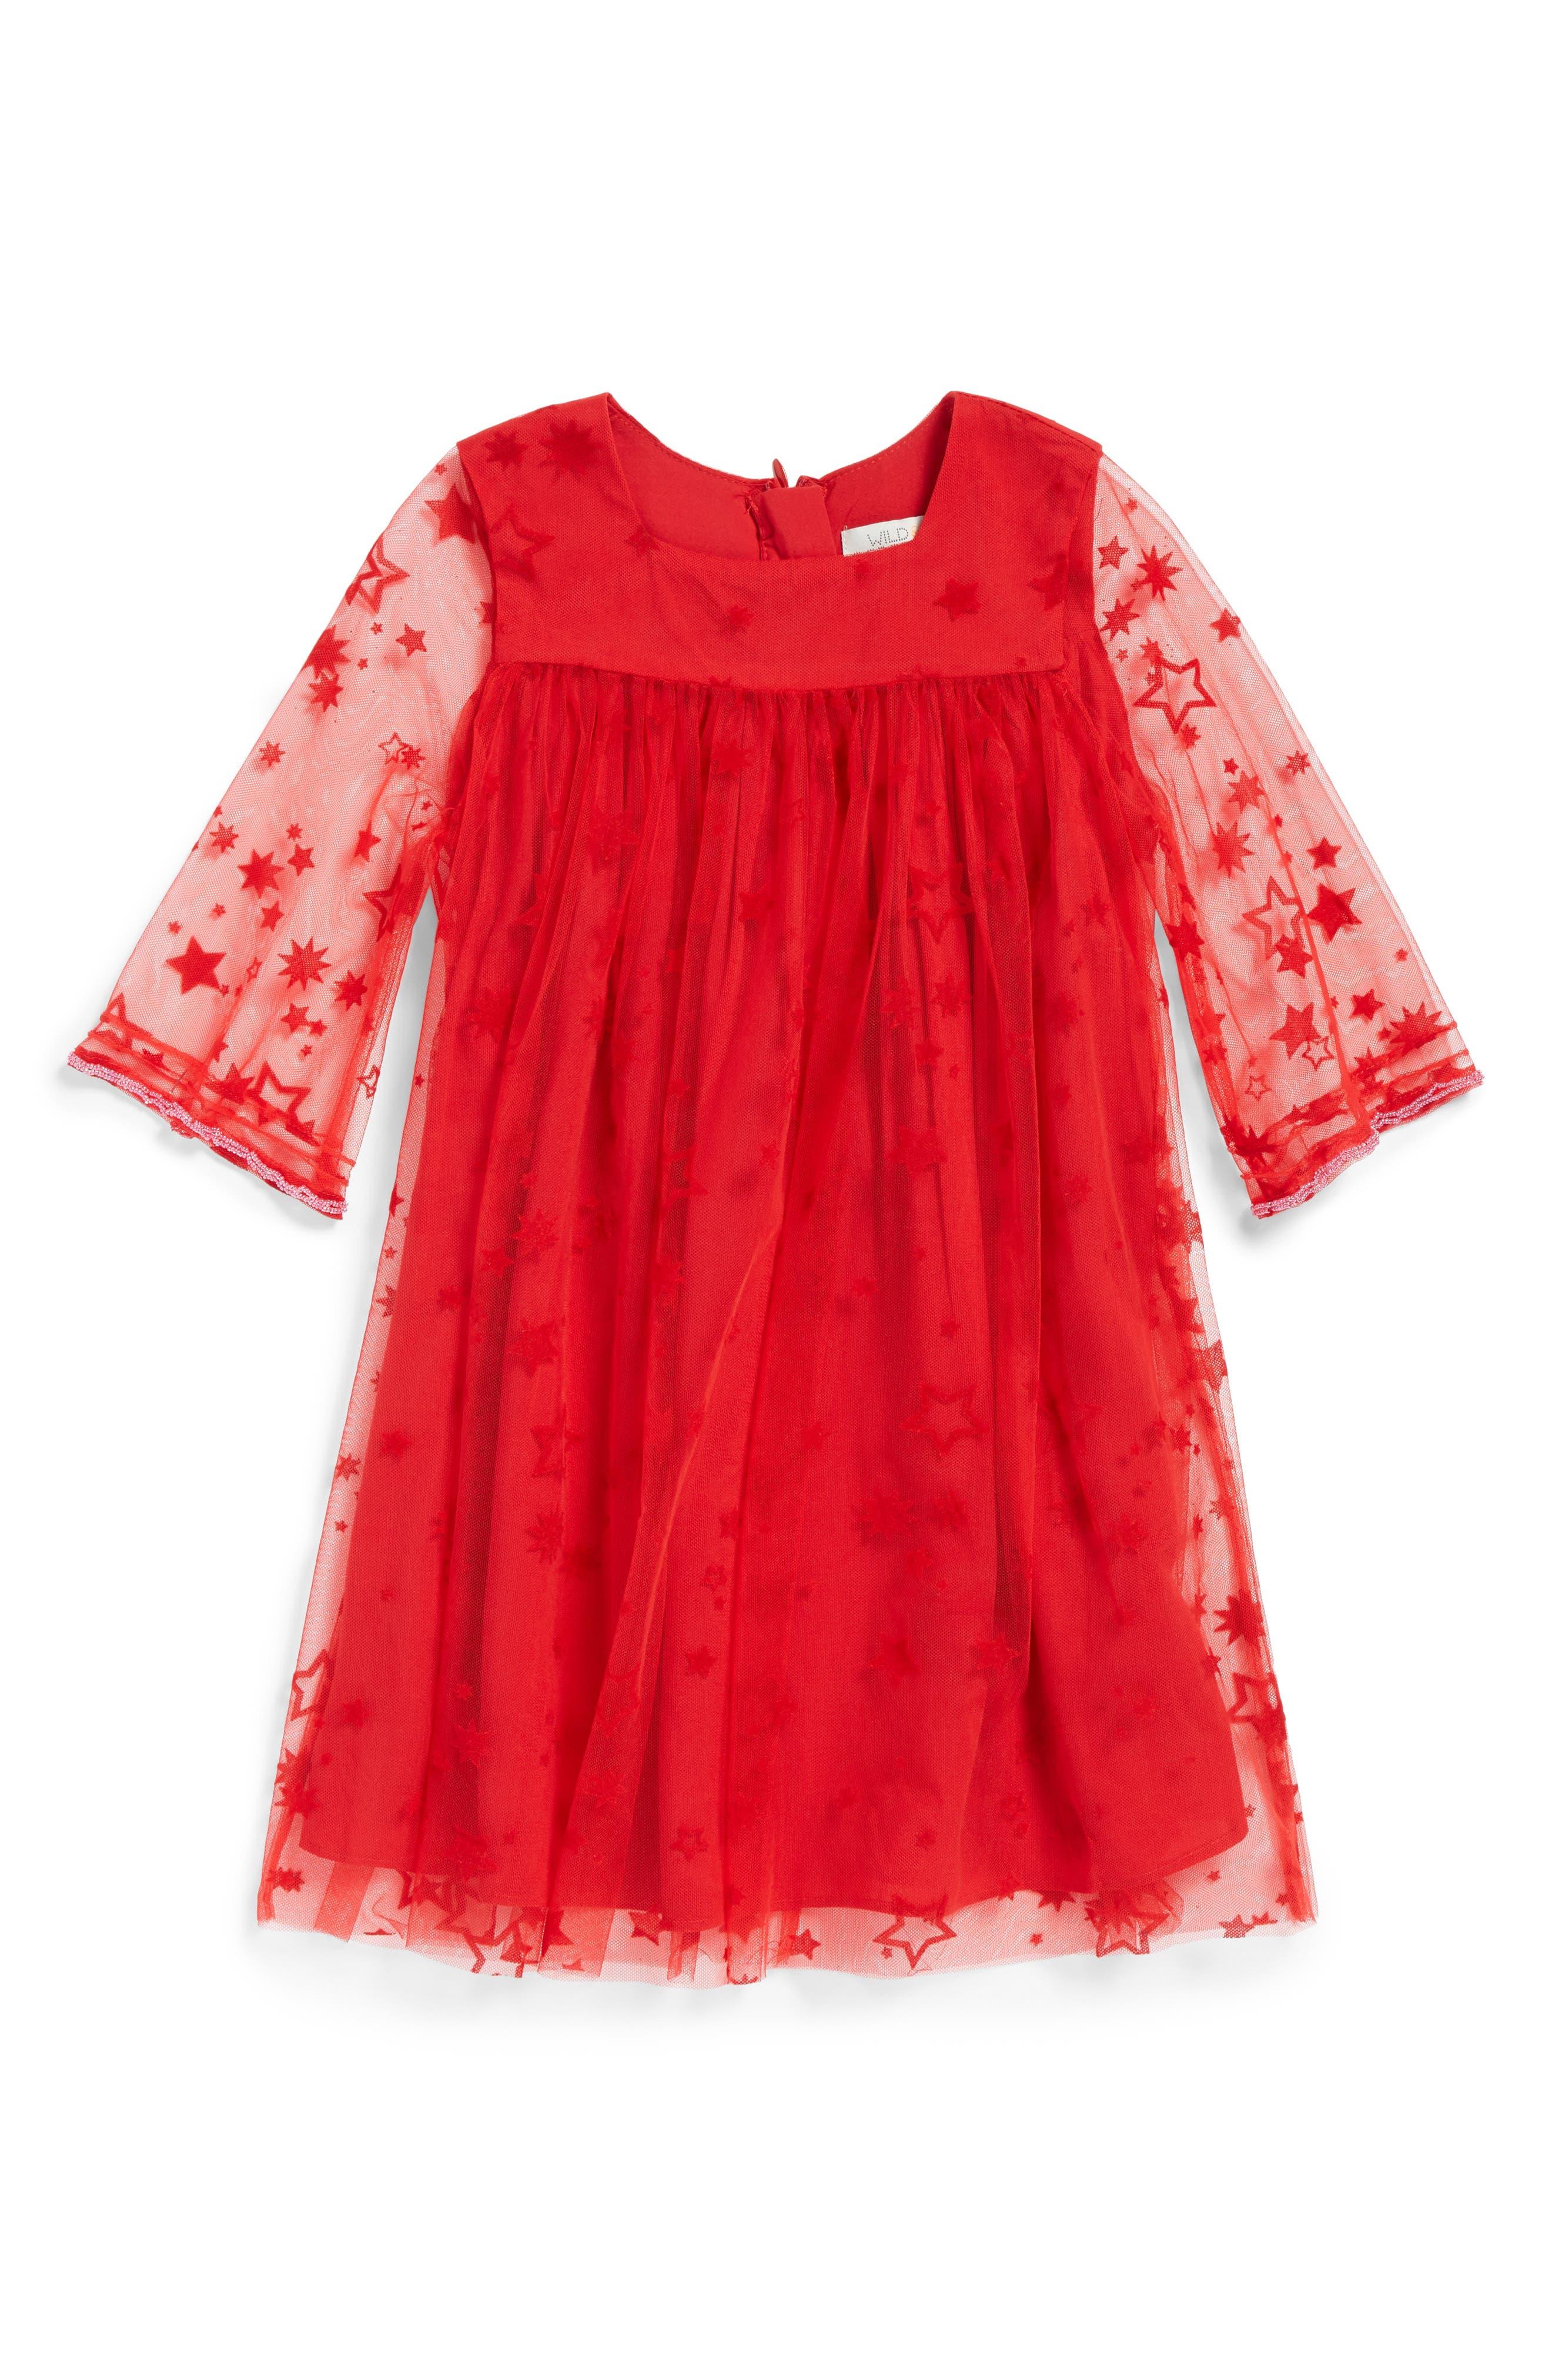 Zodiac Dress,                         Main,                         color, Red